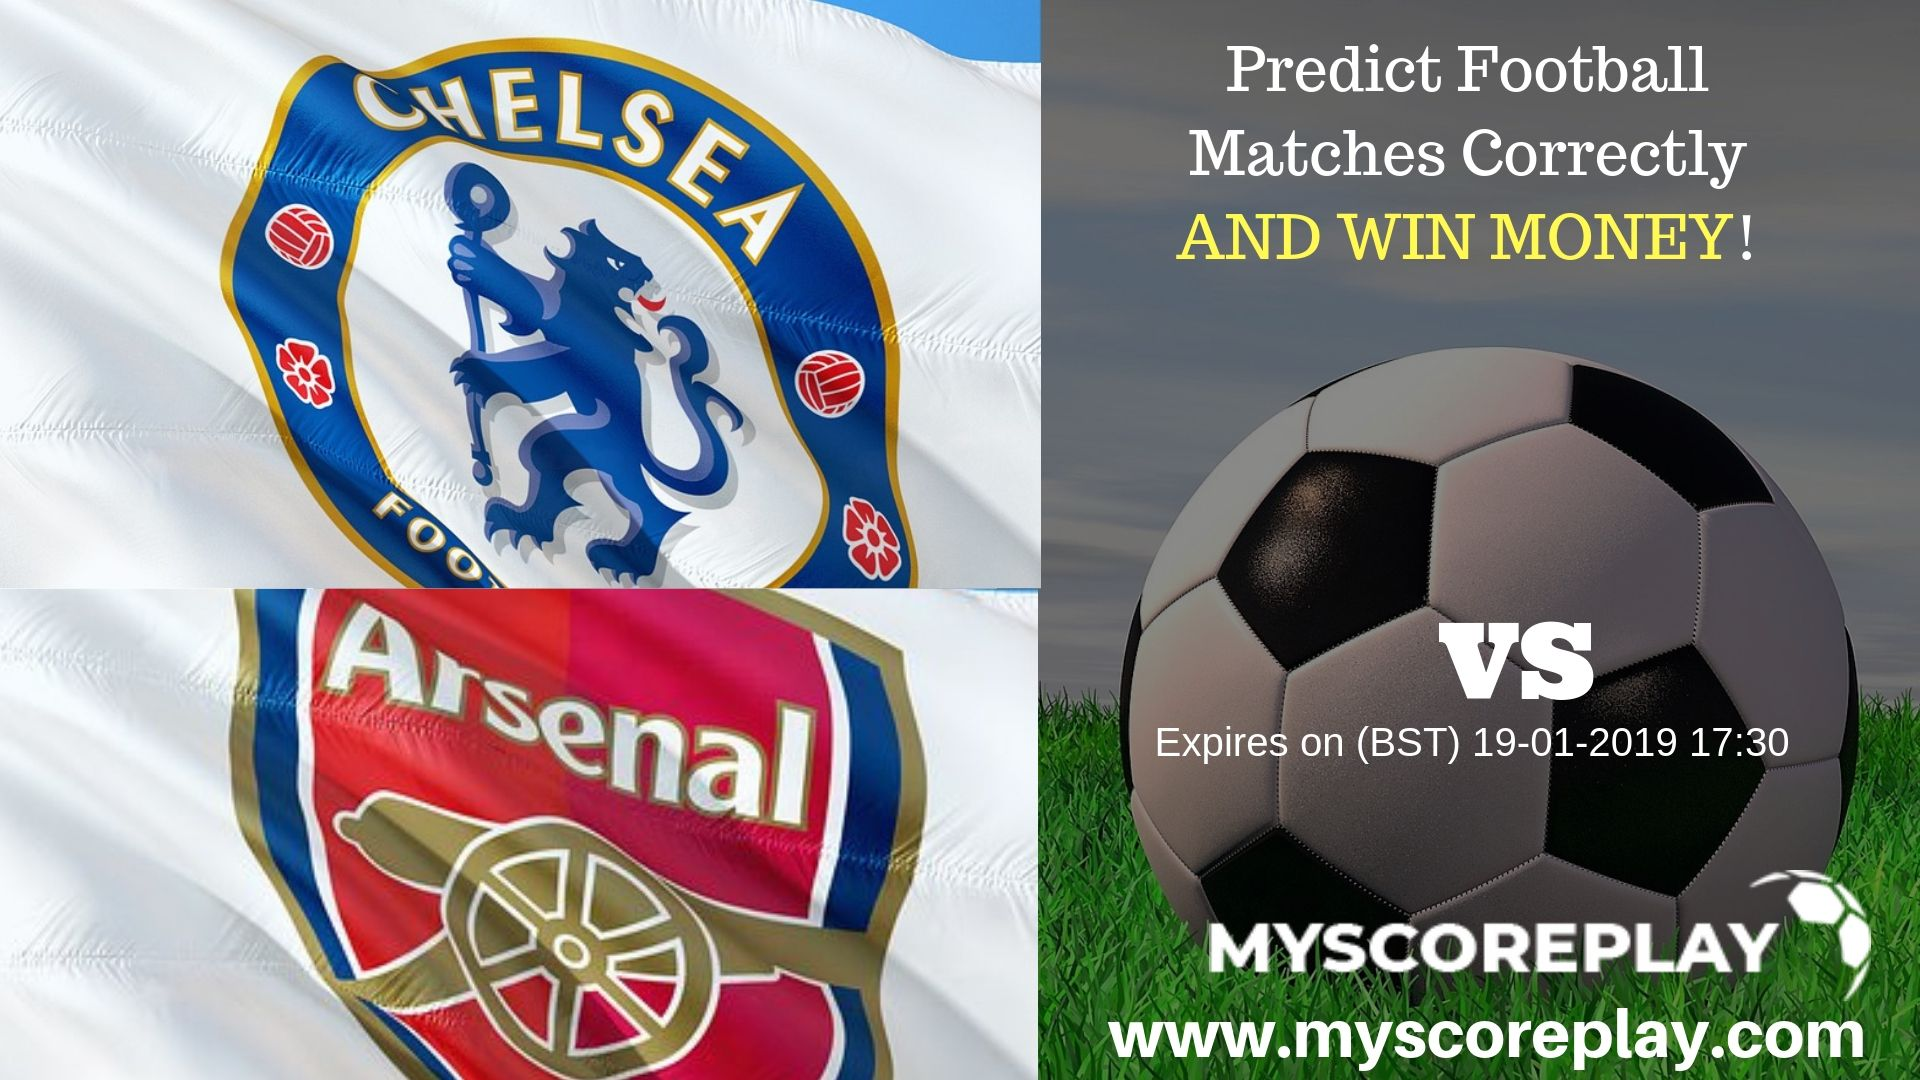 Best Site To Bet On Football Games Myscoreplay Bet Football